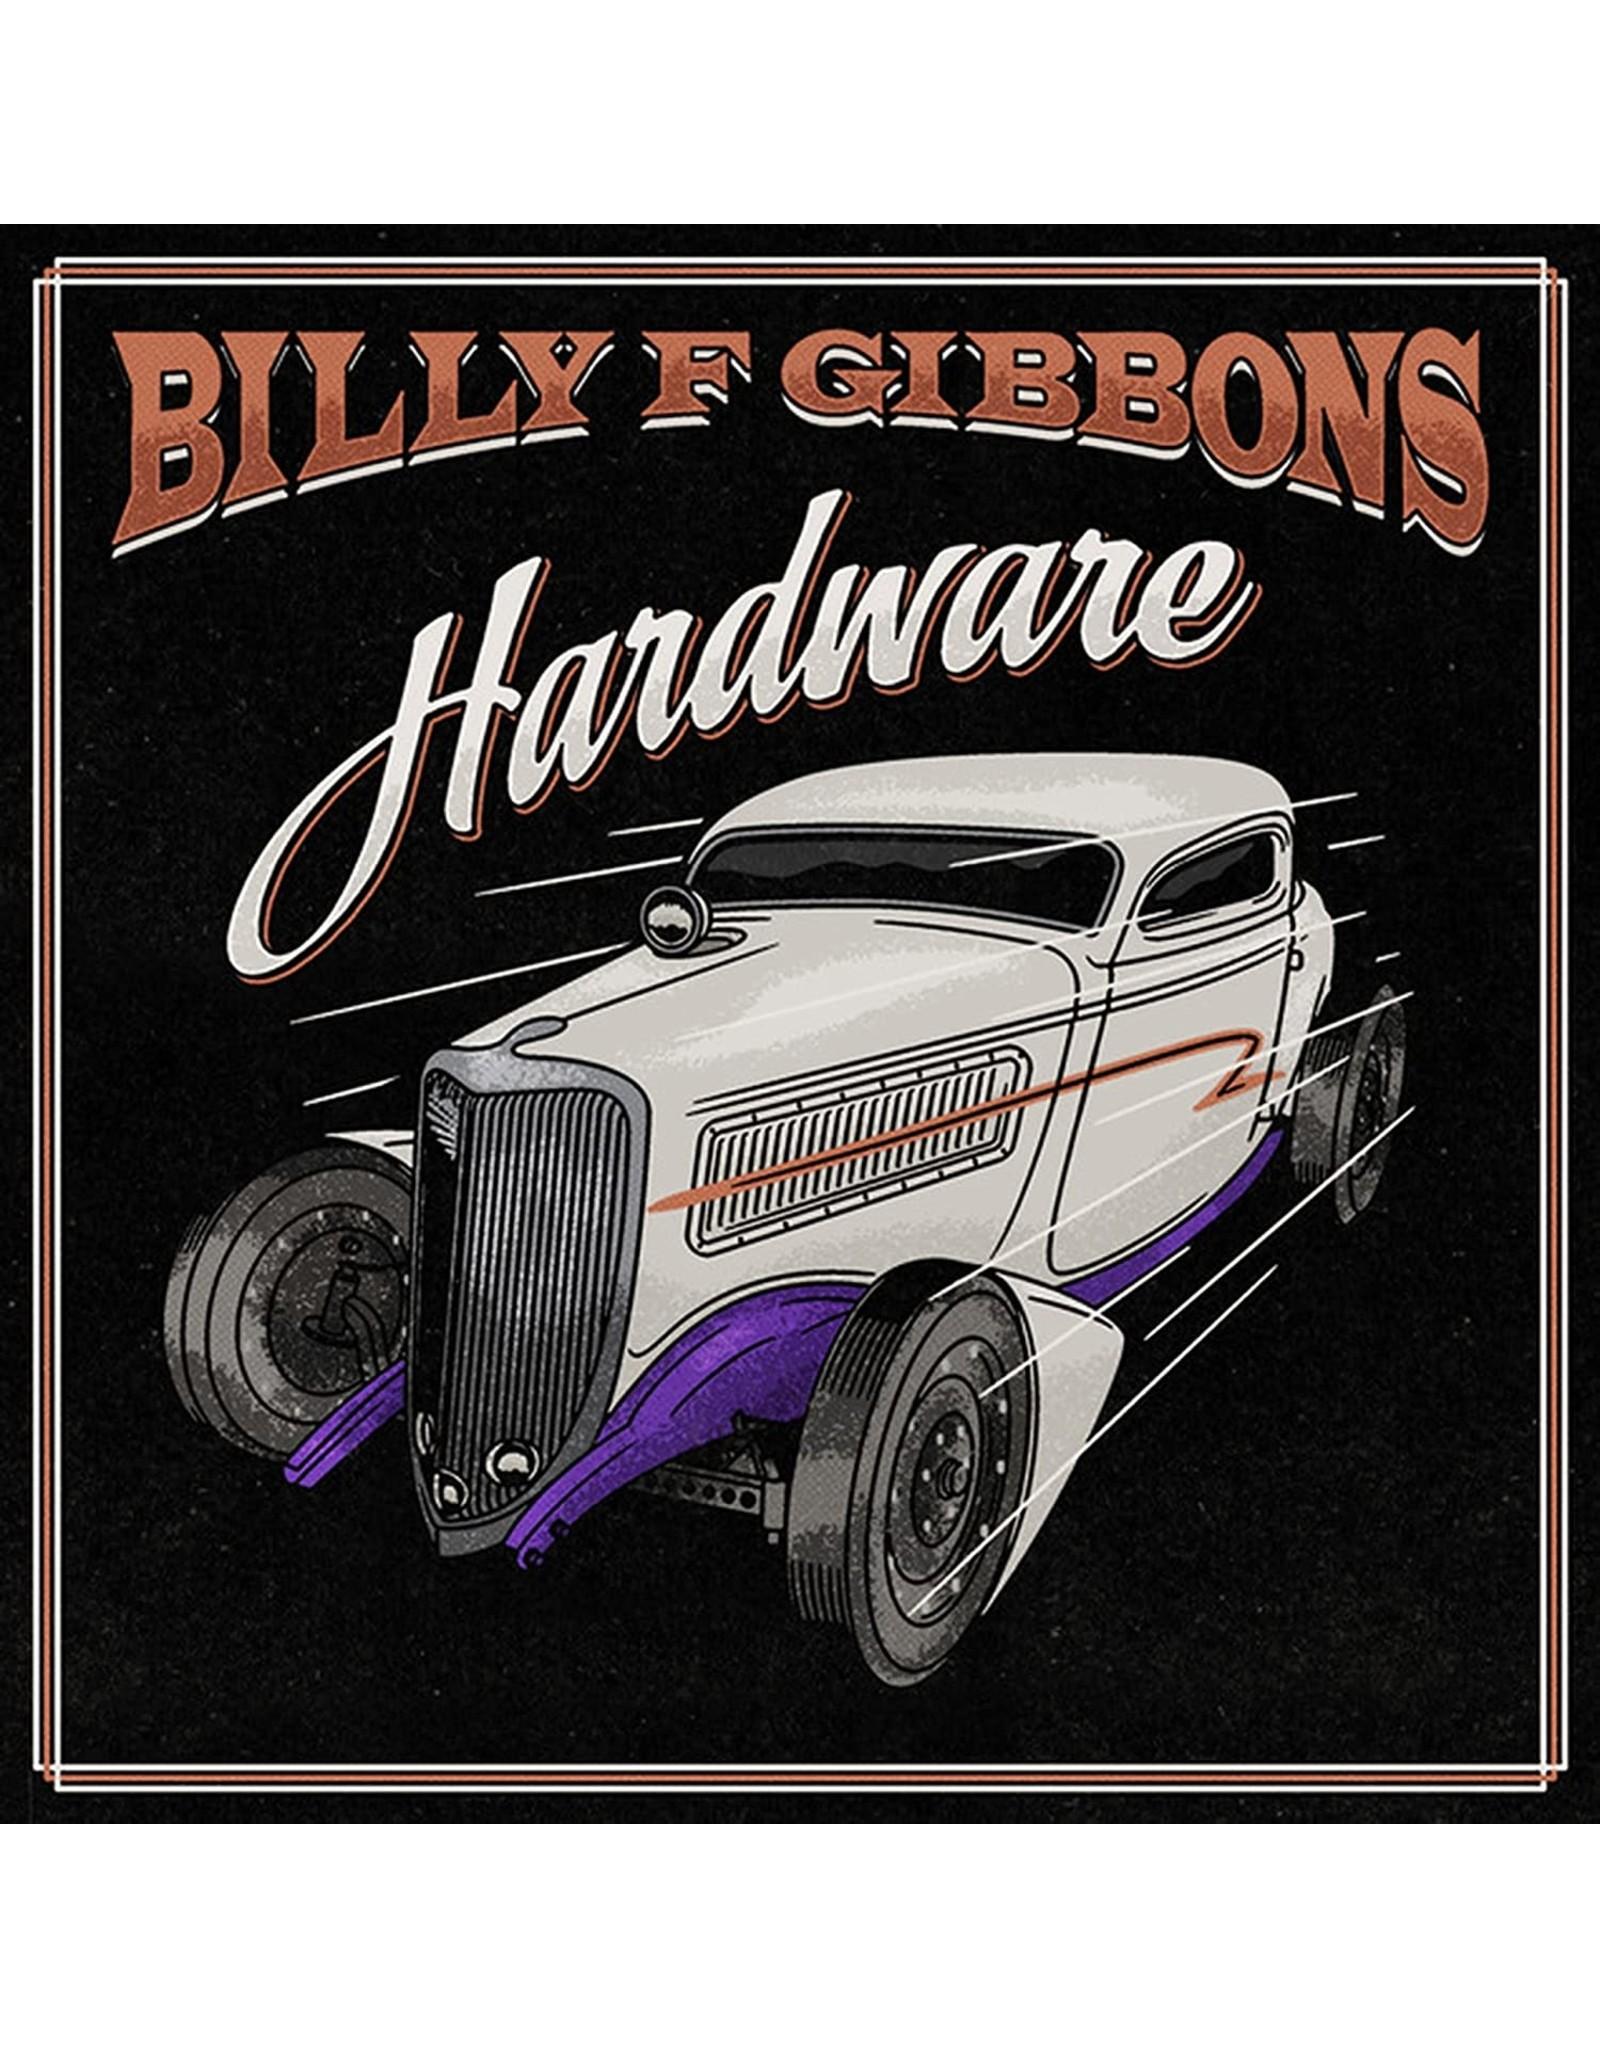 Gibbons, Billy F. - Hardware CD